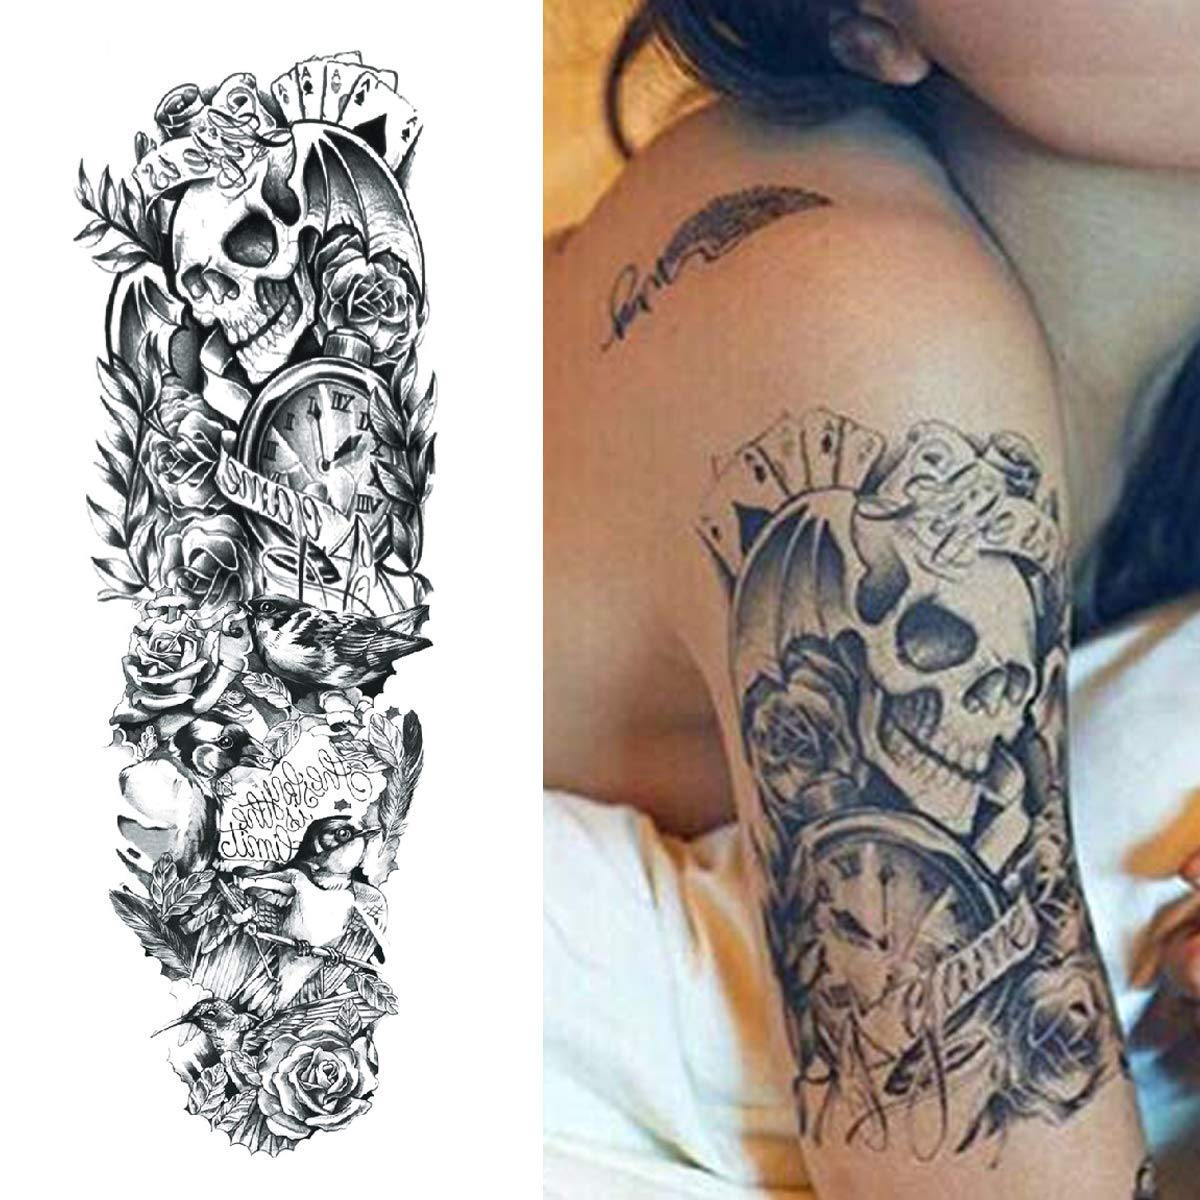 Amaza Tatuajes temporales para adultos hombre Mujer, Arte Corporal Brazos Completos tatuajes temporales, Brazo Tattoo Negros Tatuajes Adhesivos temporales ...